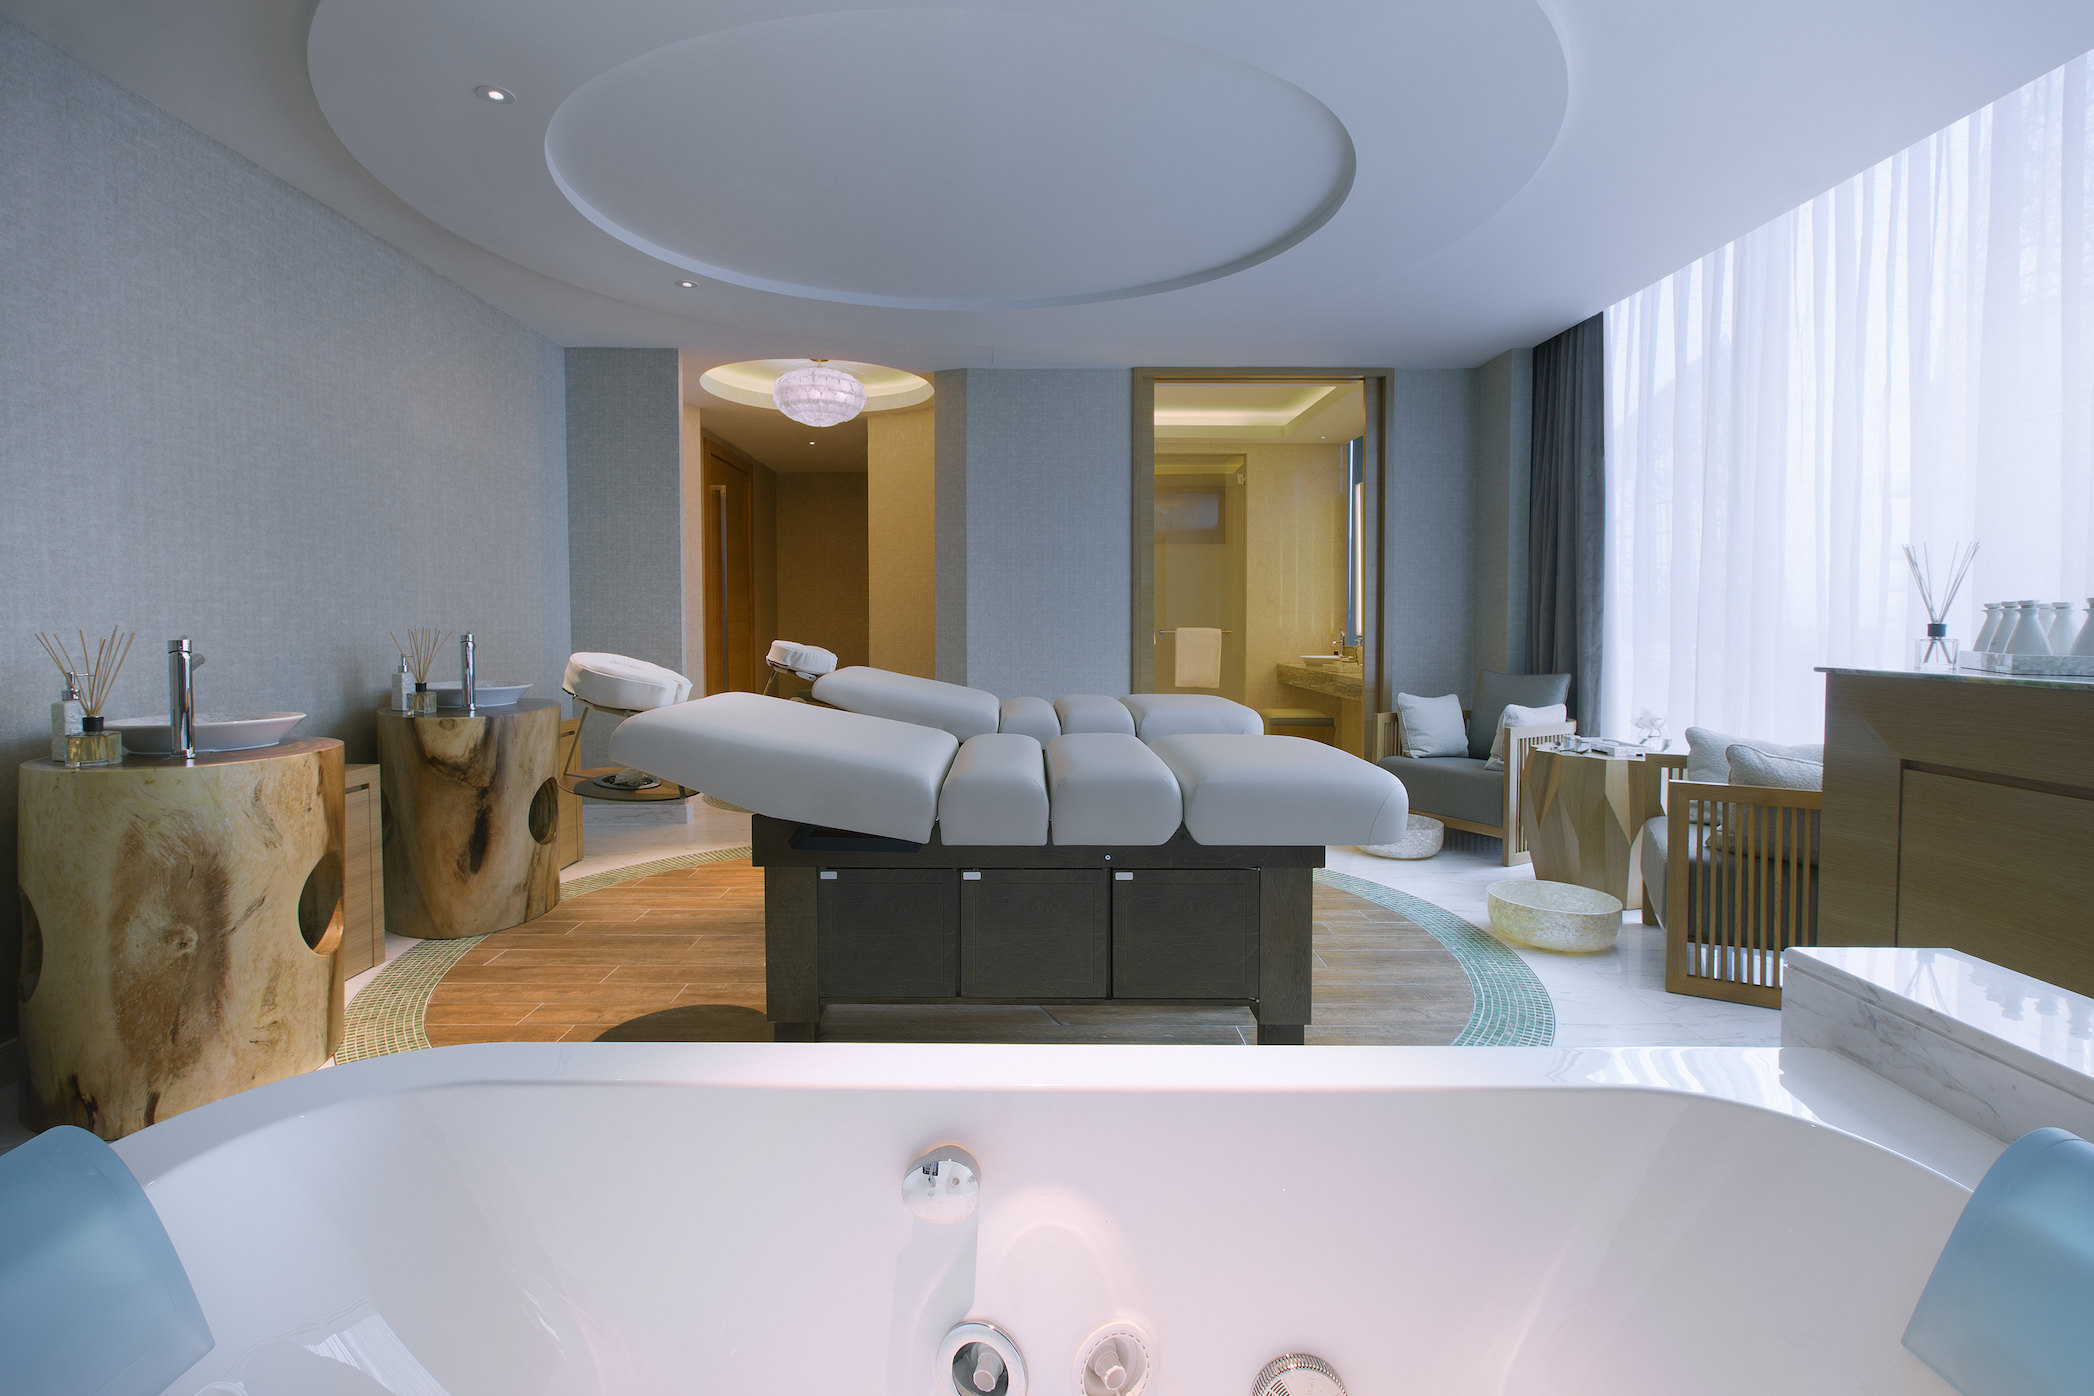 Luxury spas in Singapore: Heavenly Spa